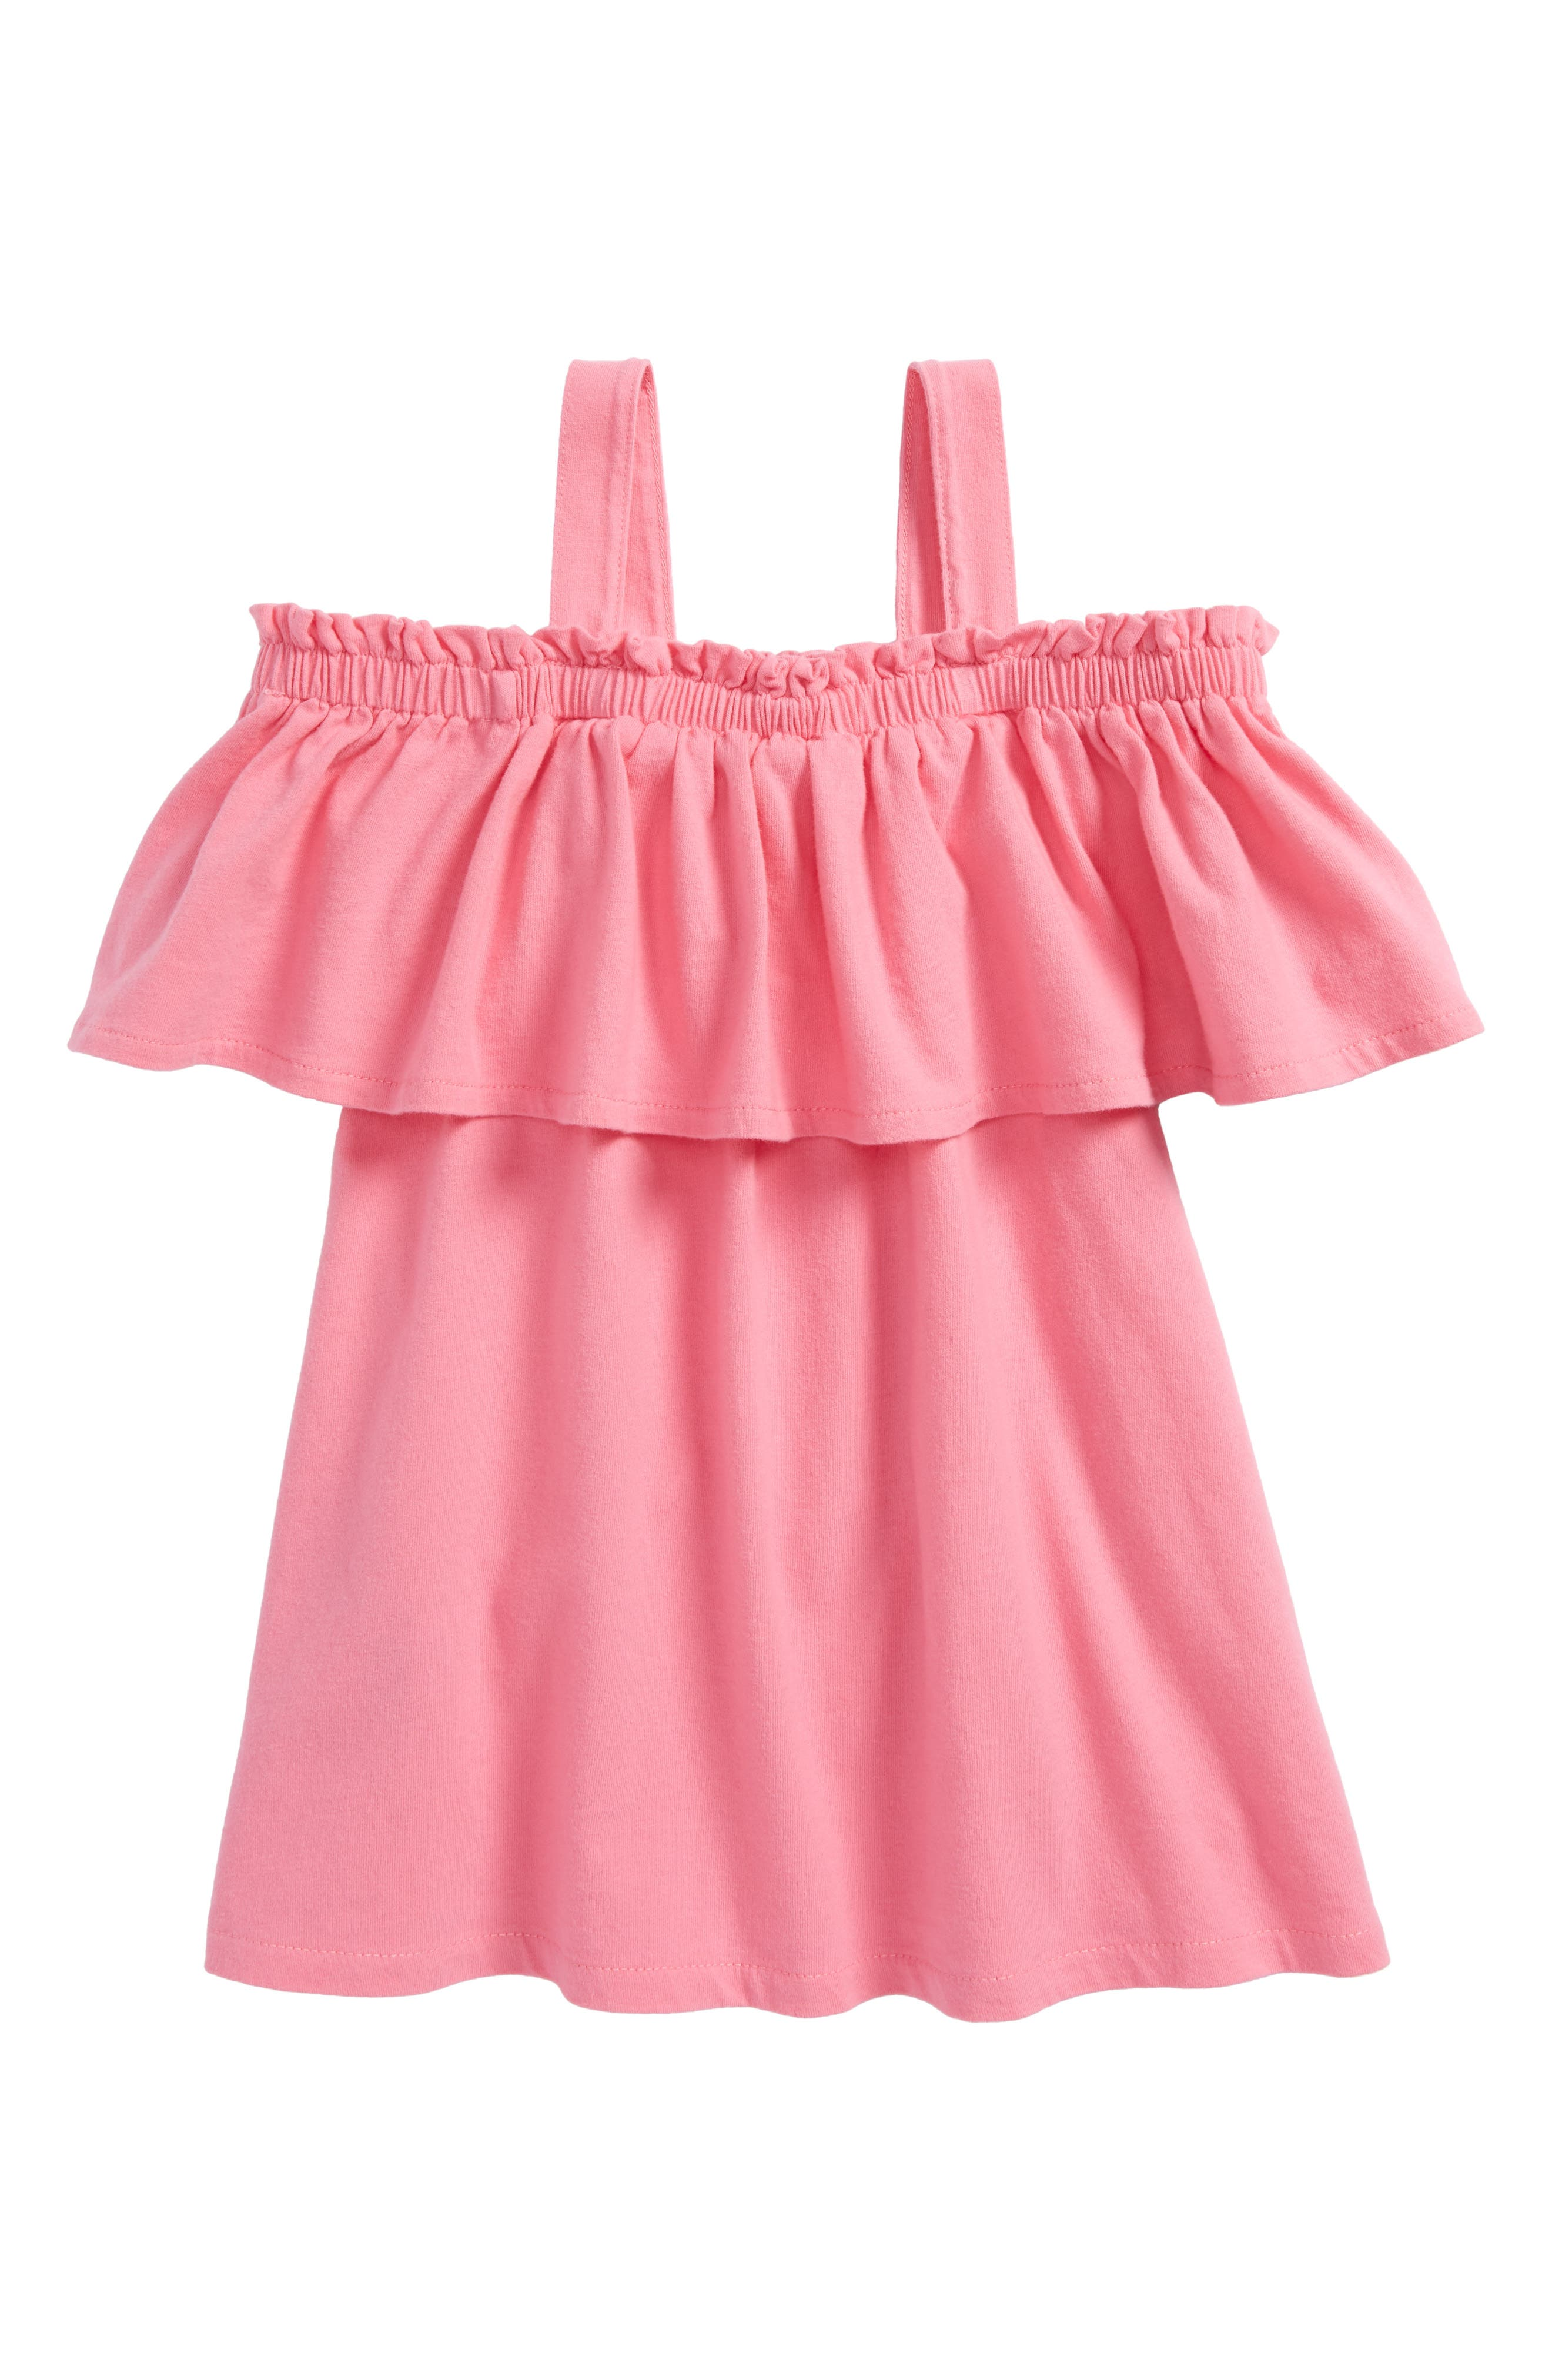 Main Image - Hudson Kids Candy Cold Shoulder Ruffle Top (Big Girls)